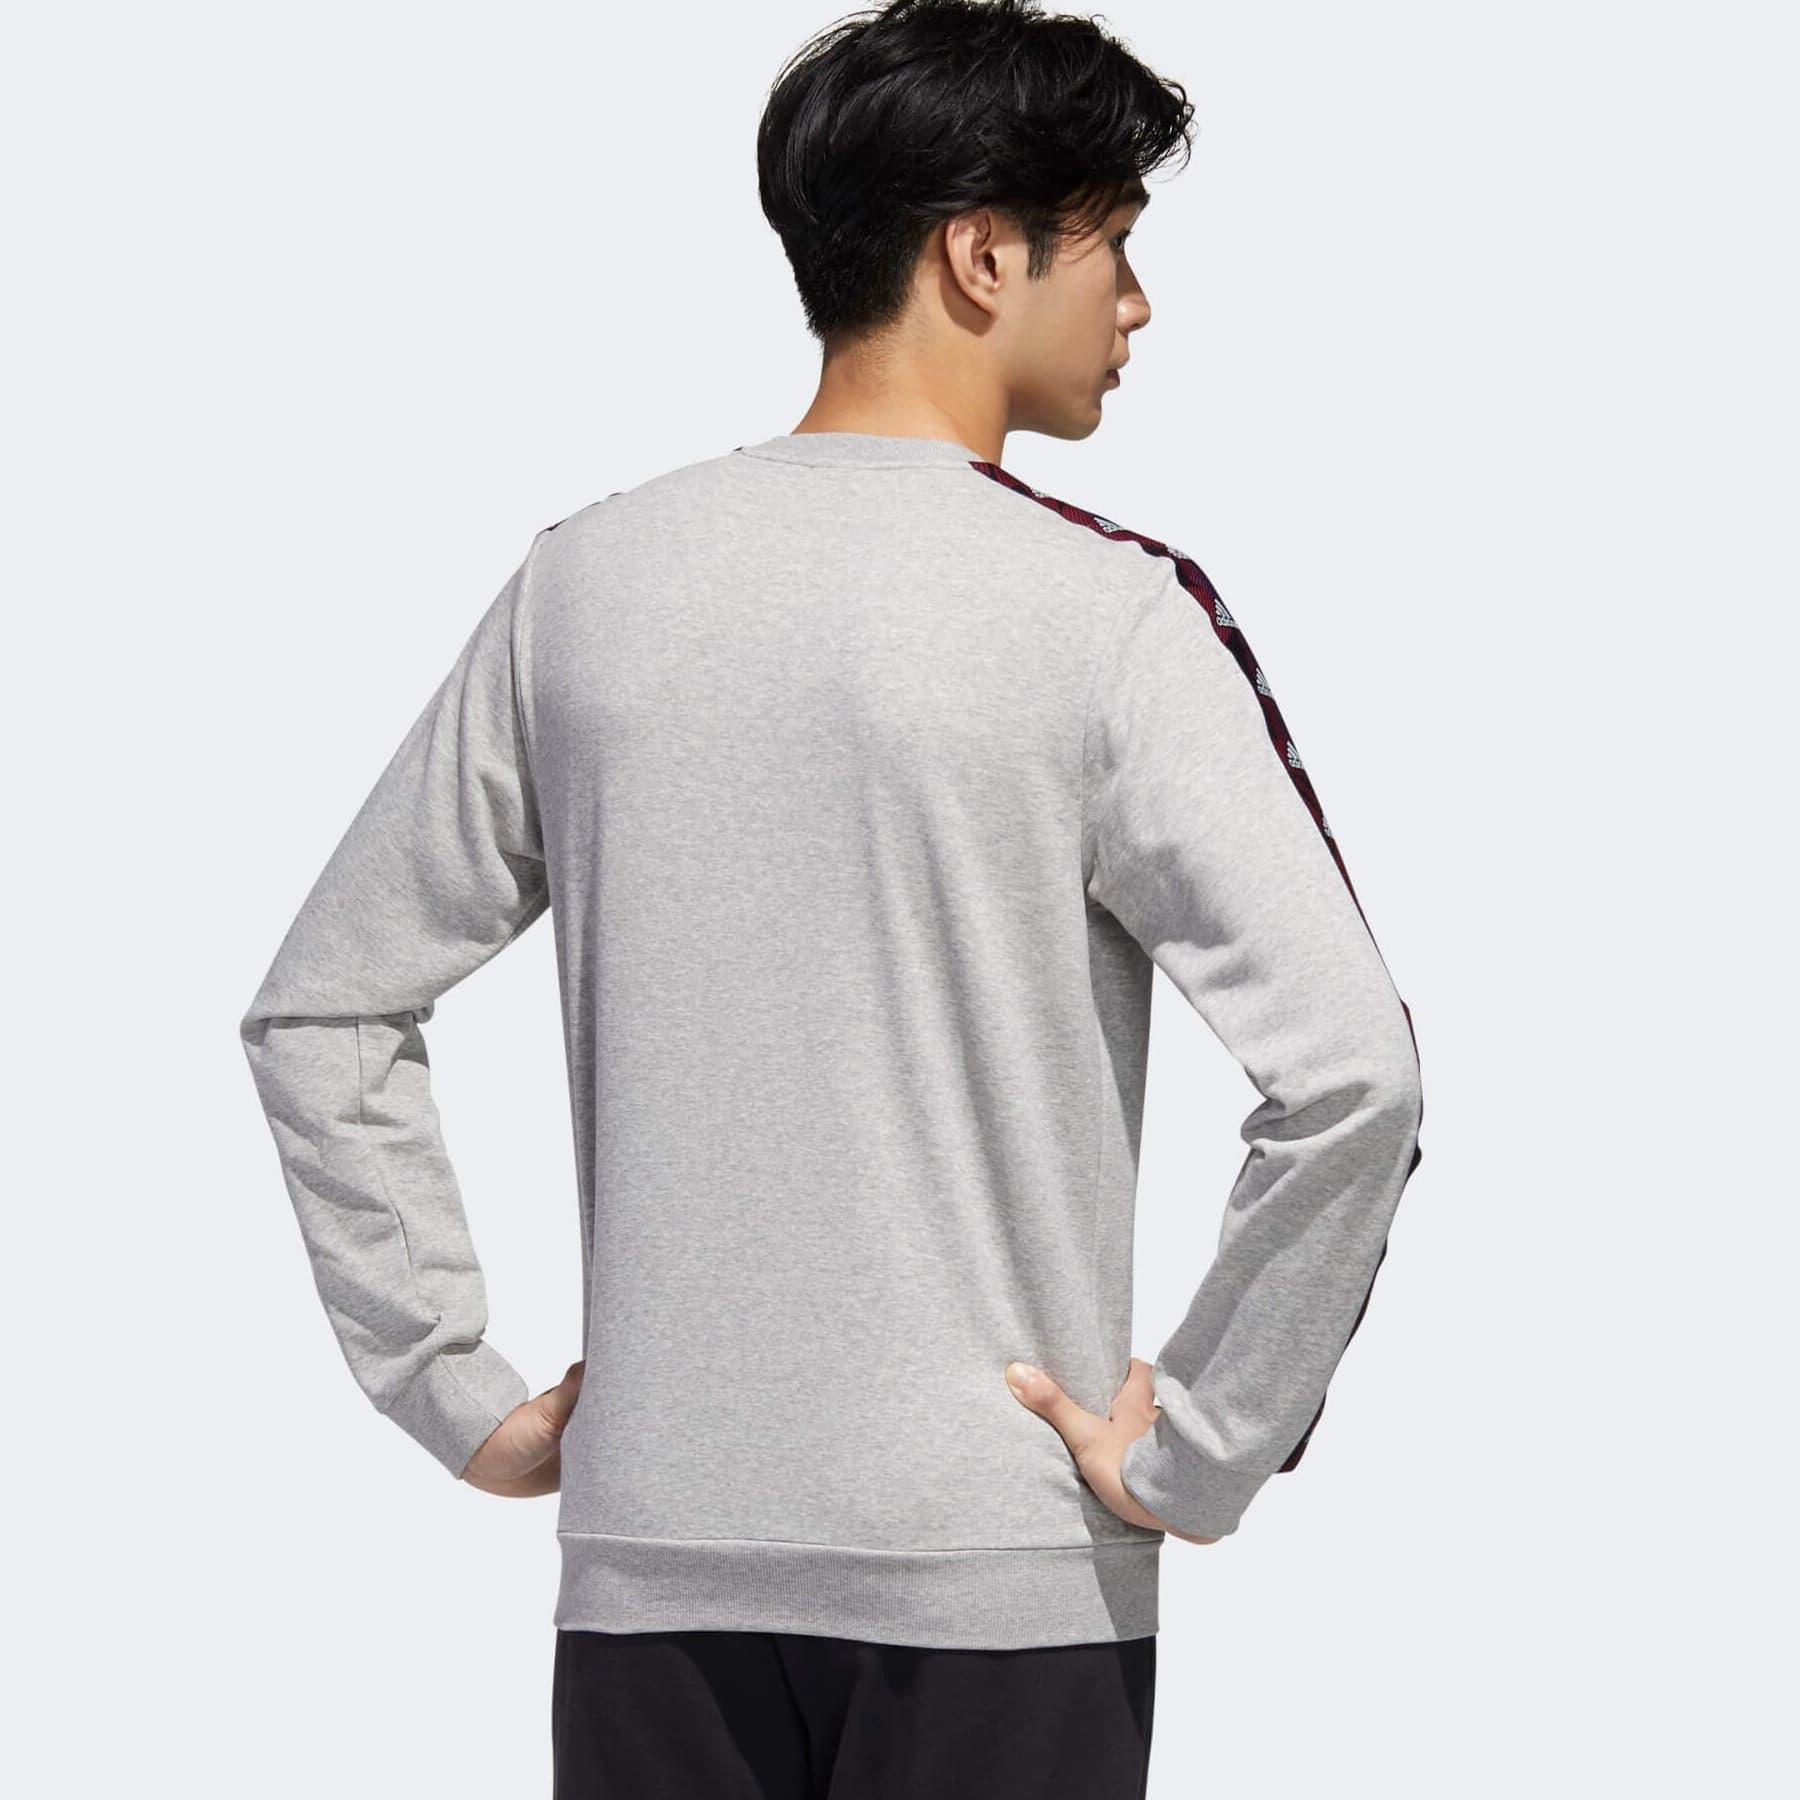 Essentials Tape Erkek Gri Sweatshirt